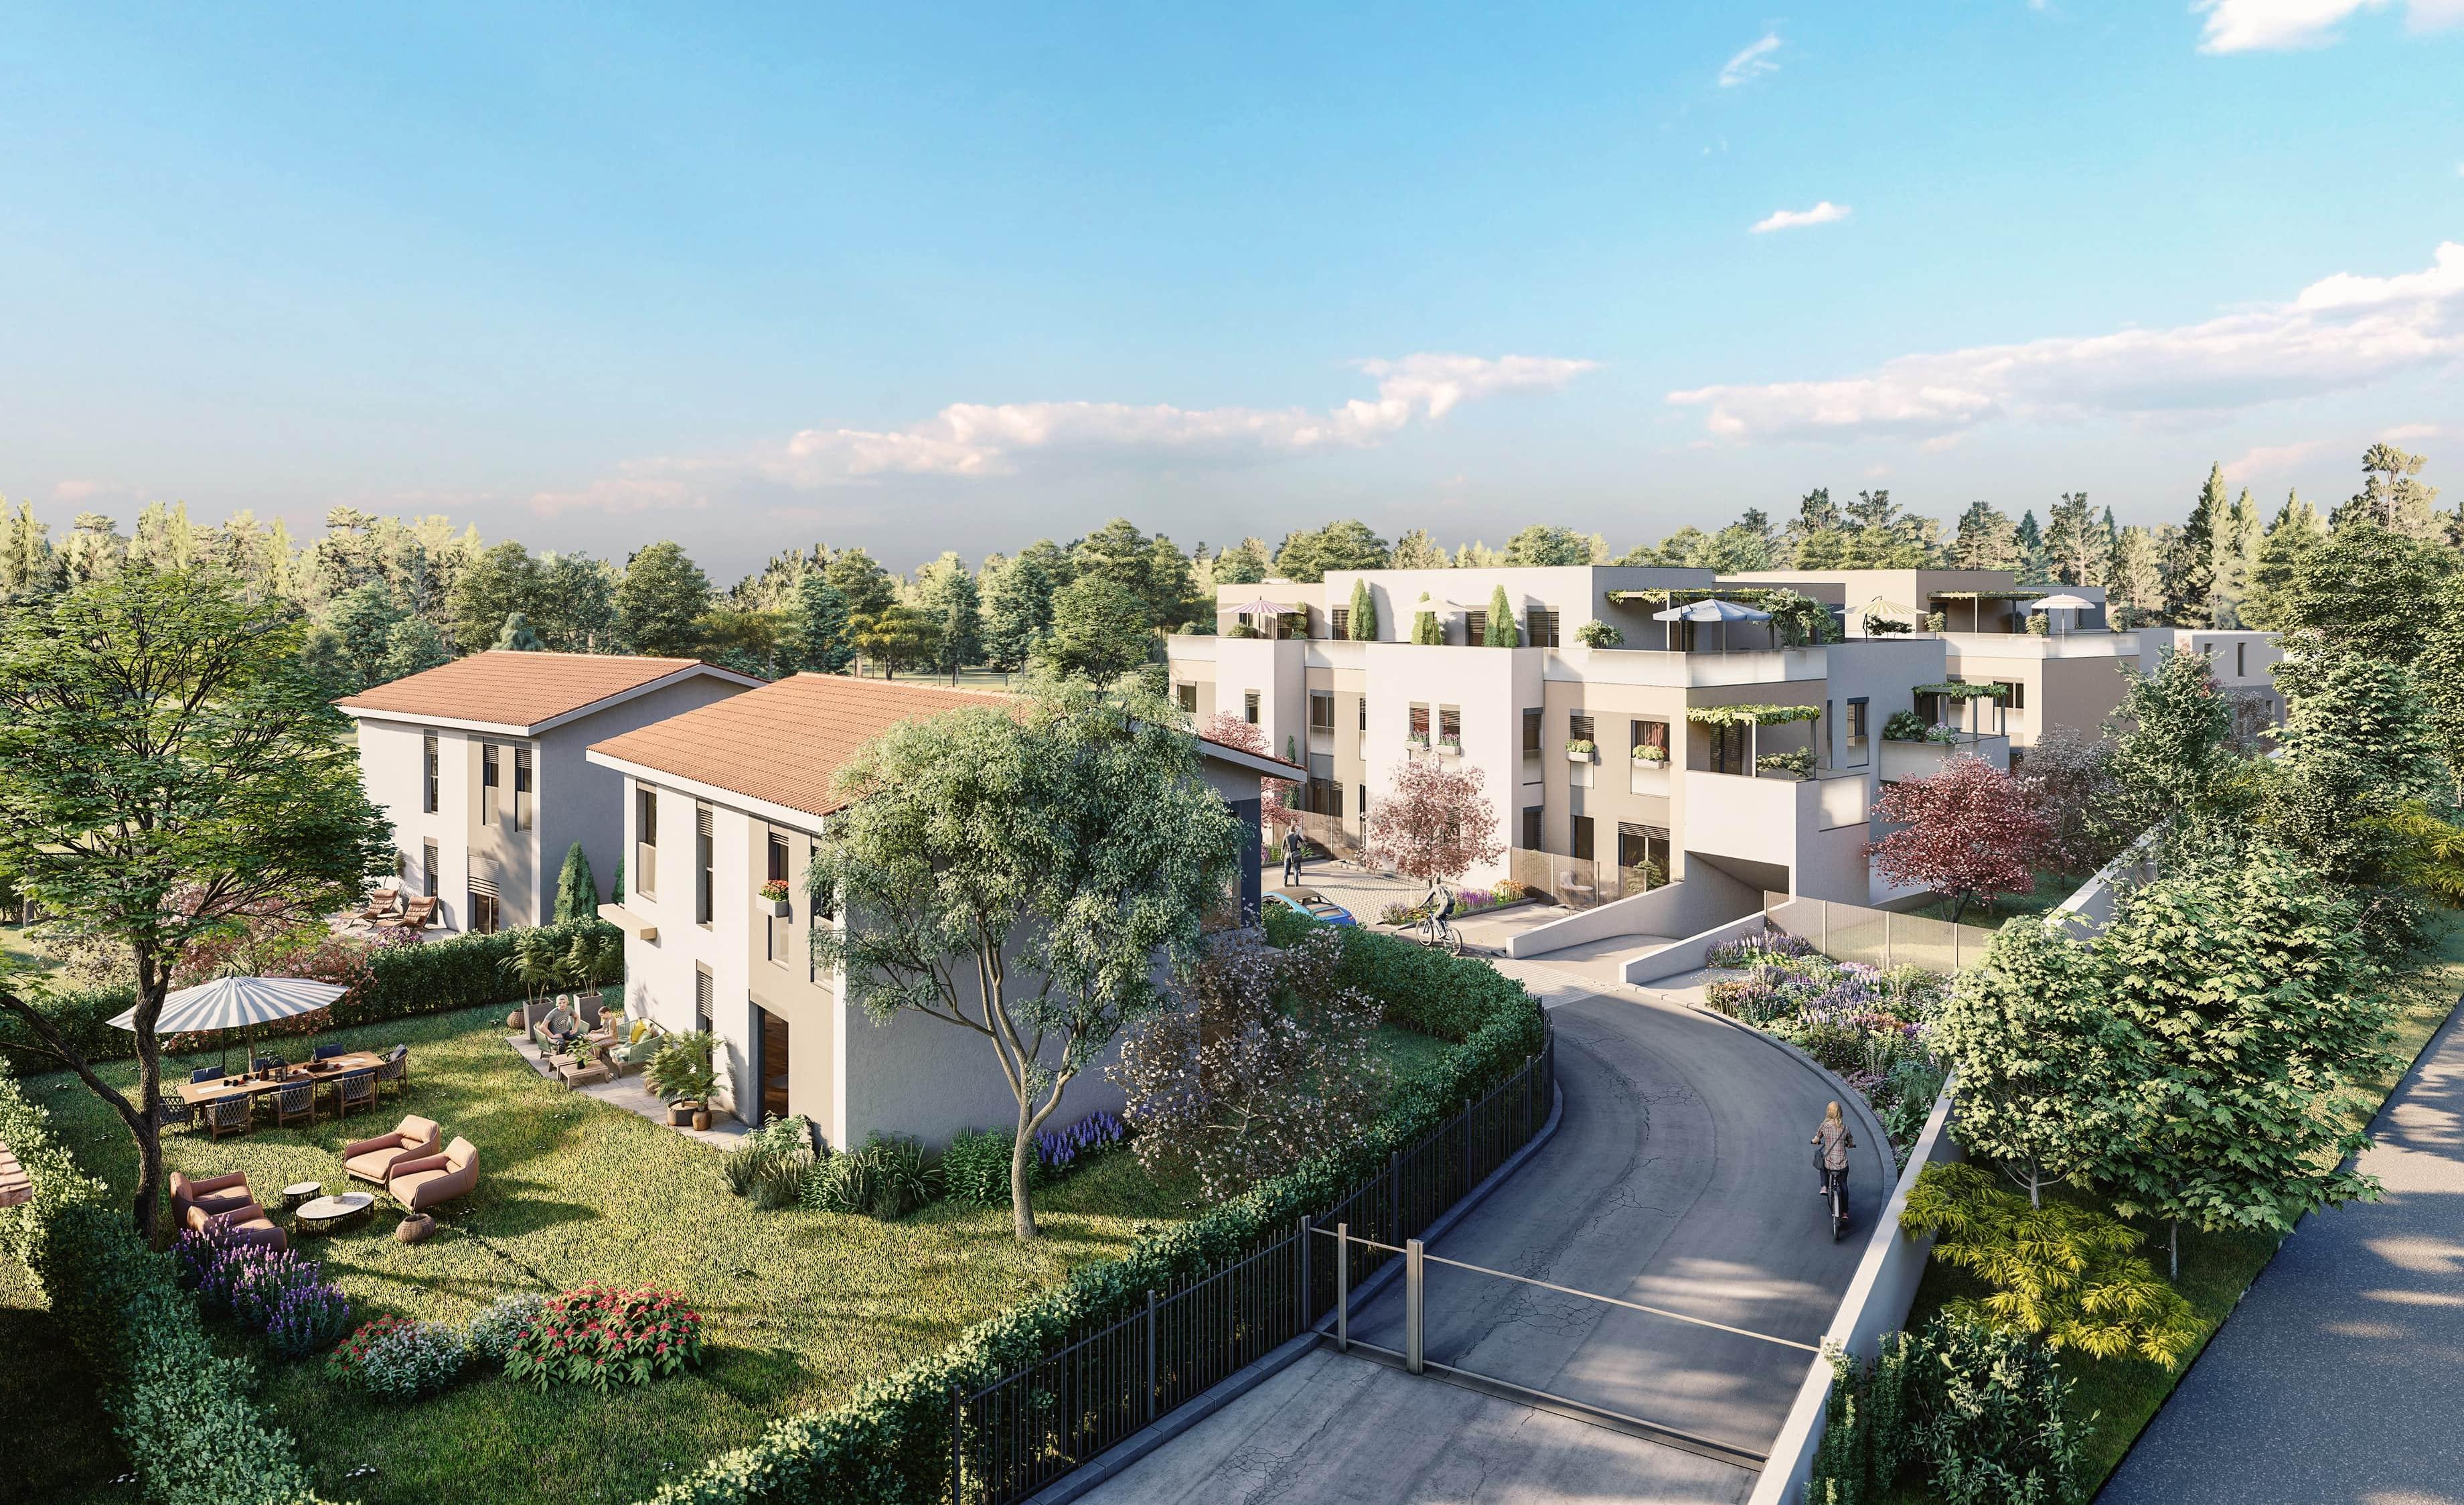 Programme immobilier Sainte-Foy-les-Lyon (69110) Plan du loup EIF4